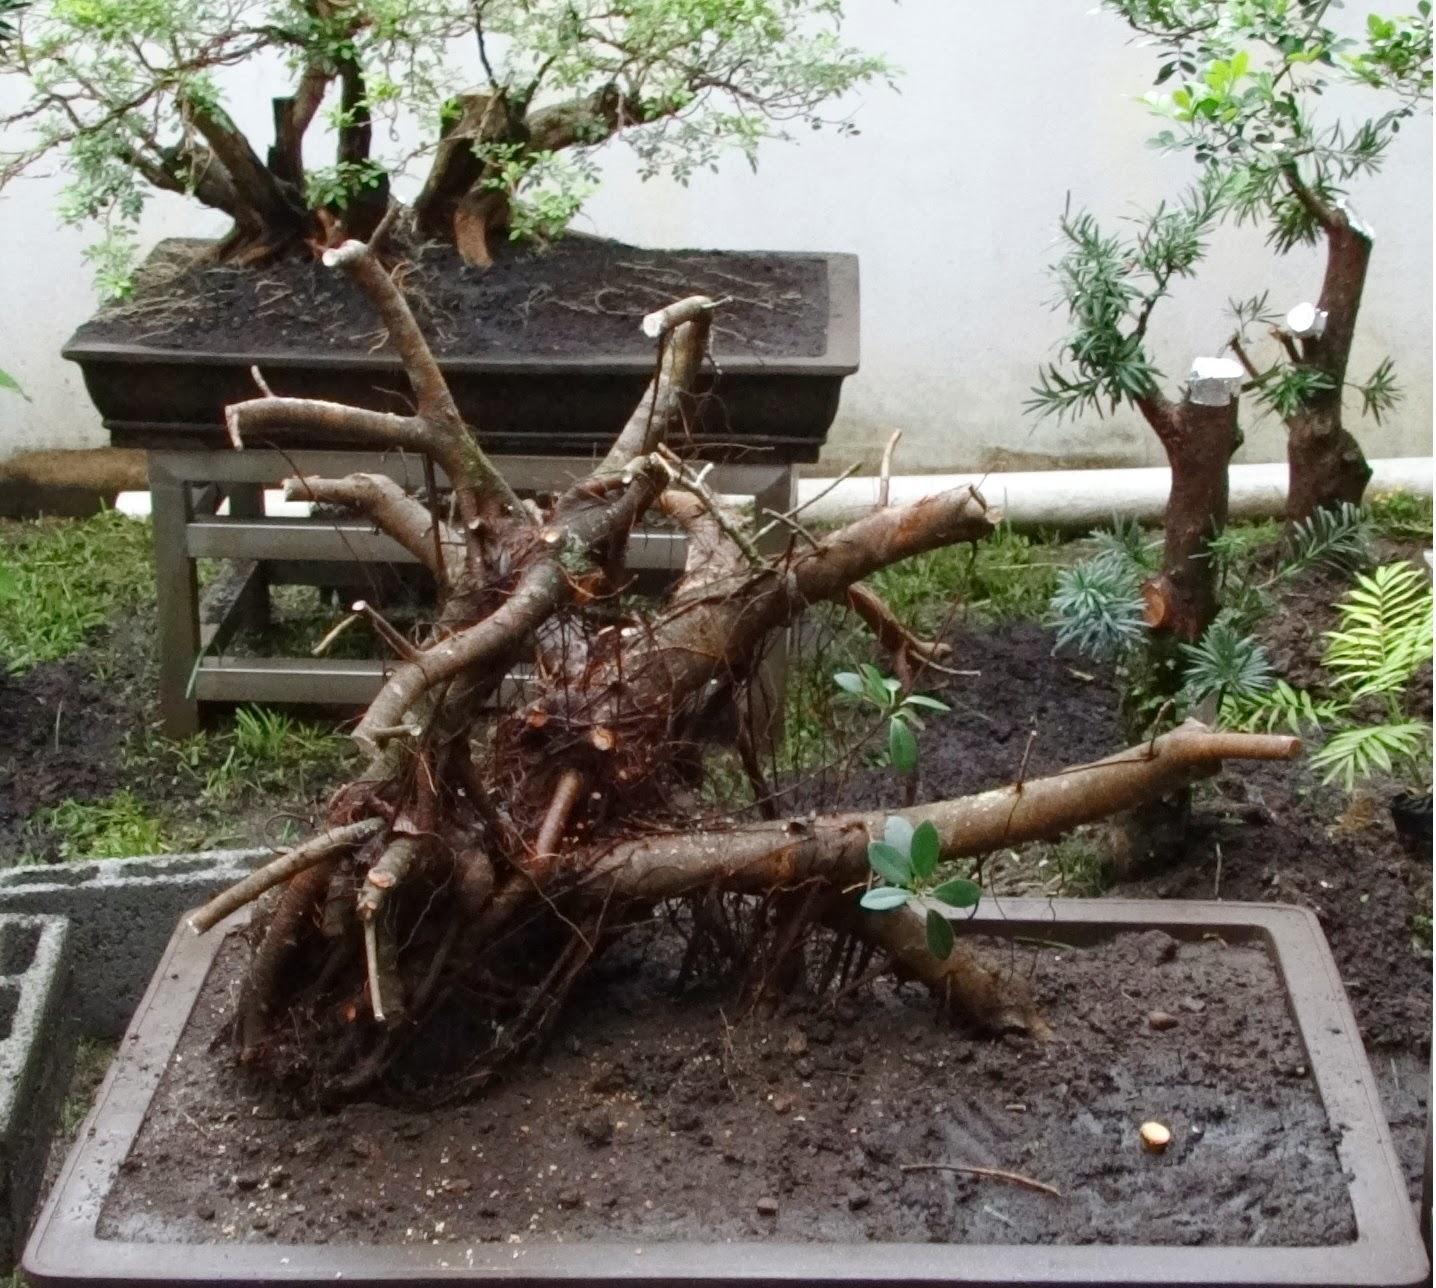 Penjing bonsai estilo cultura de china en panam artes - Como cultivar bonsais ...